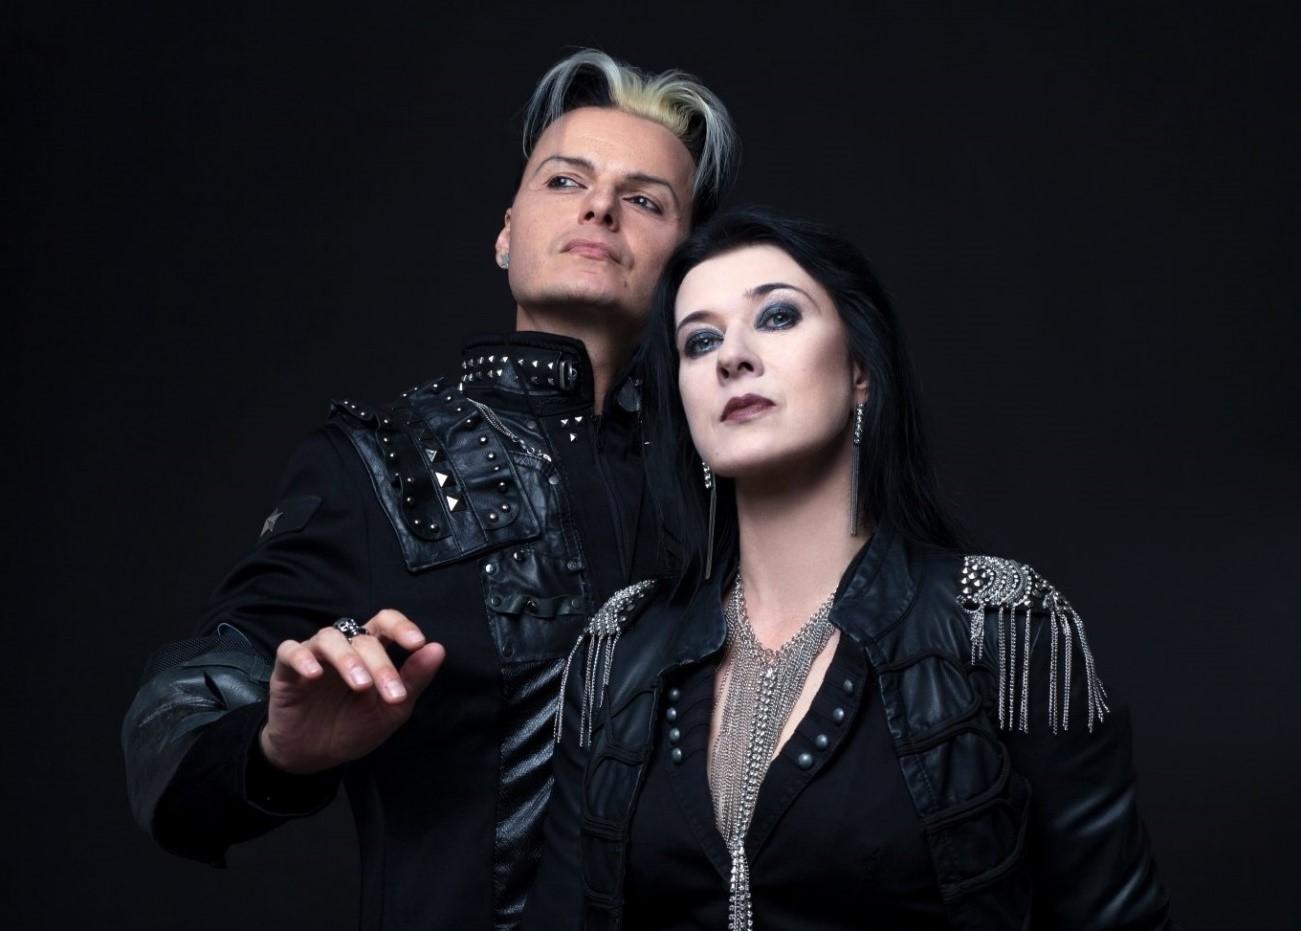 Lacrimosa llega a Argentina como parte de su Time Travel World Tour 2019